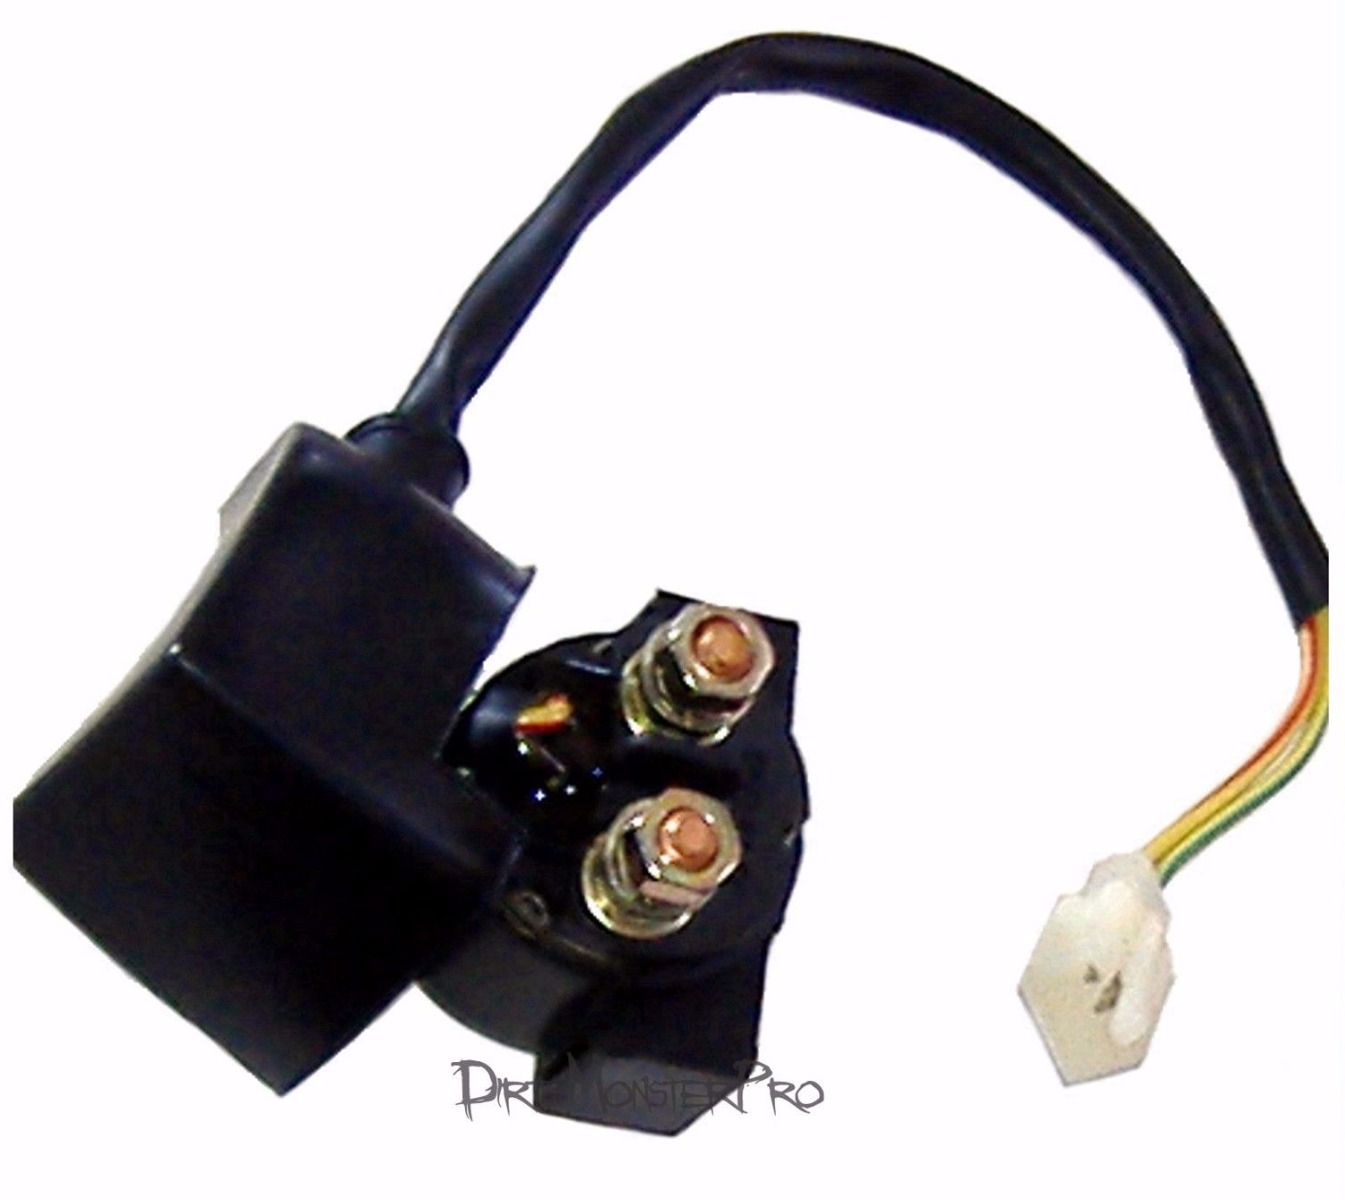 full wire loom wiring harness cc cc cc cc atv quad product information